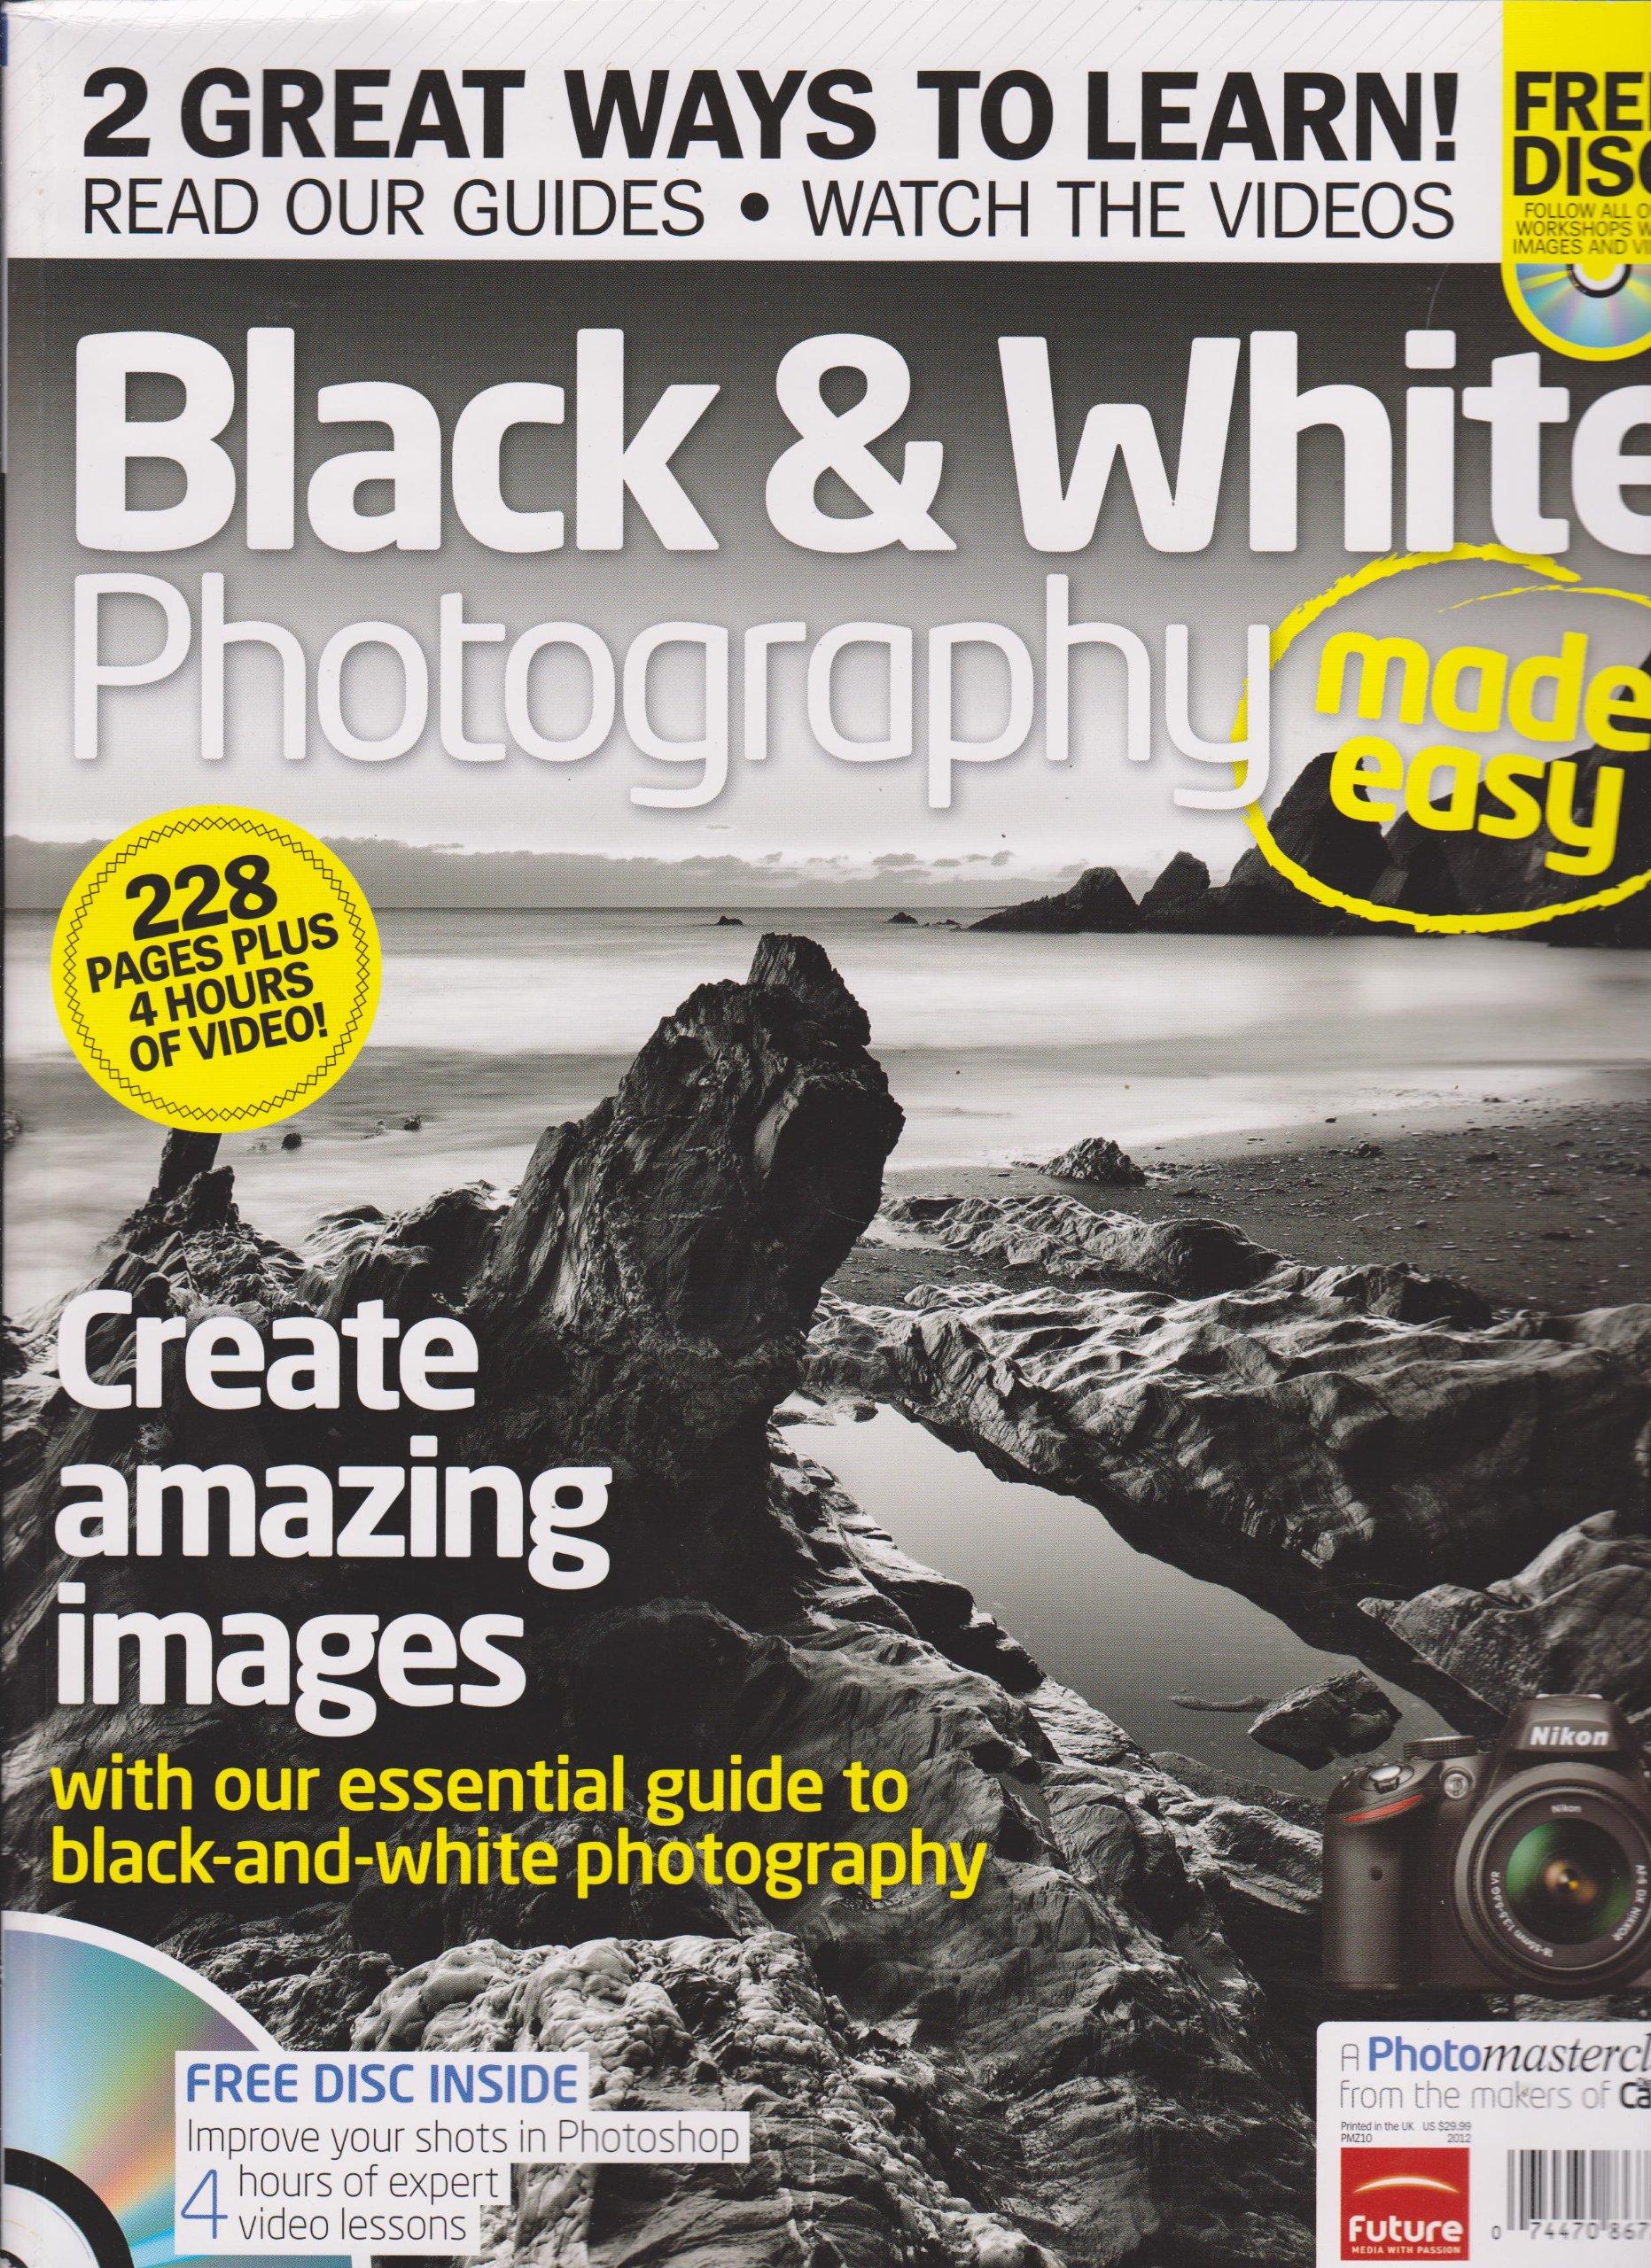 Photo Masterclass Black & White Photography Made Easy